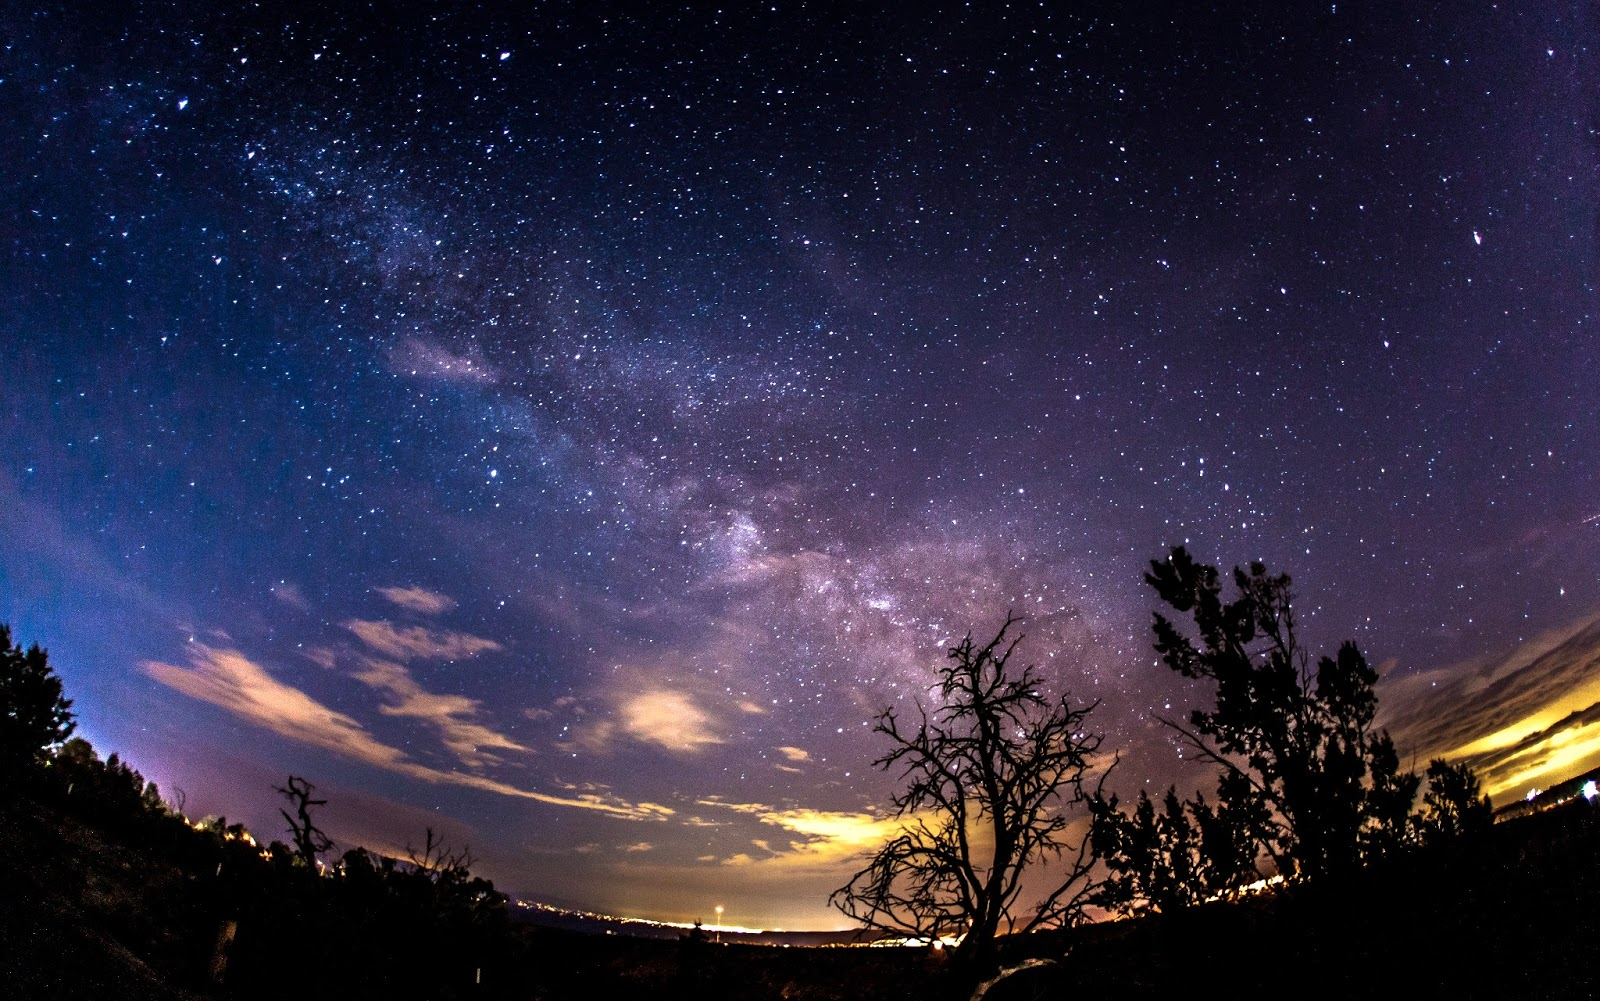 Amazing Milky Way Wallpapers: Milky Way Background